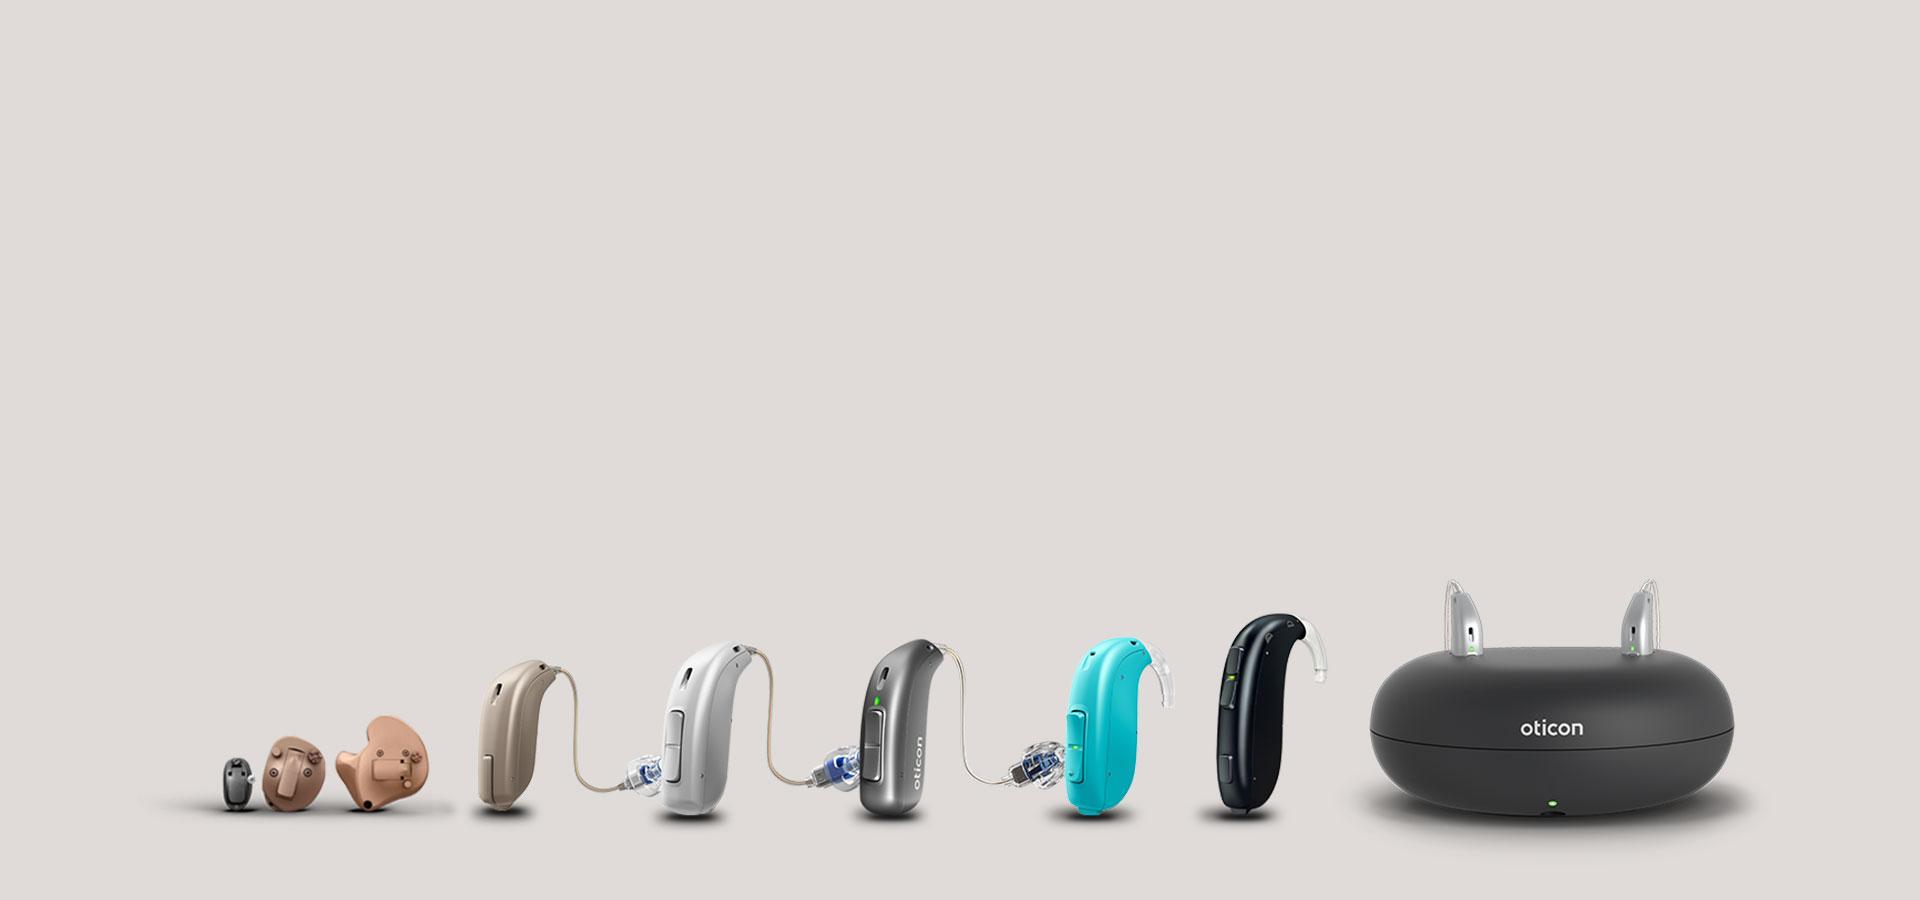 introbanner-kinds-of-hearing-aids-1920x900-v1